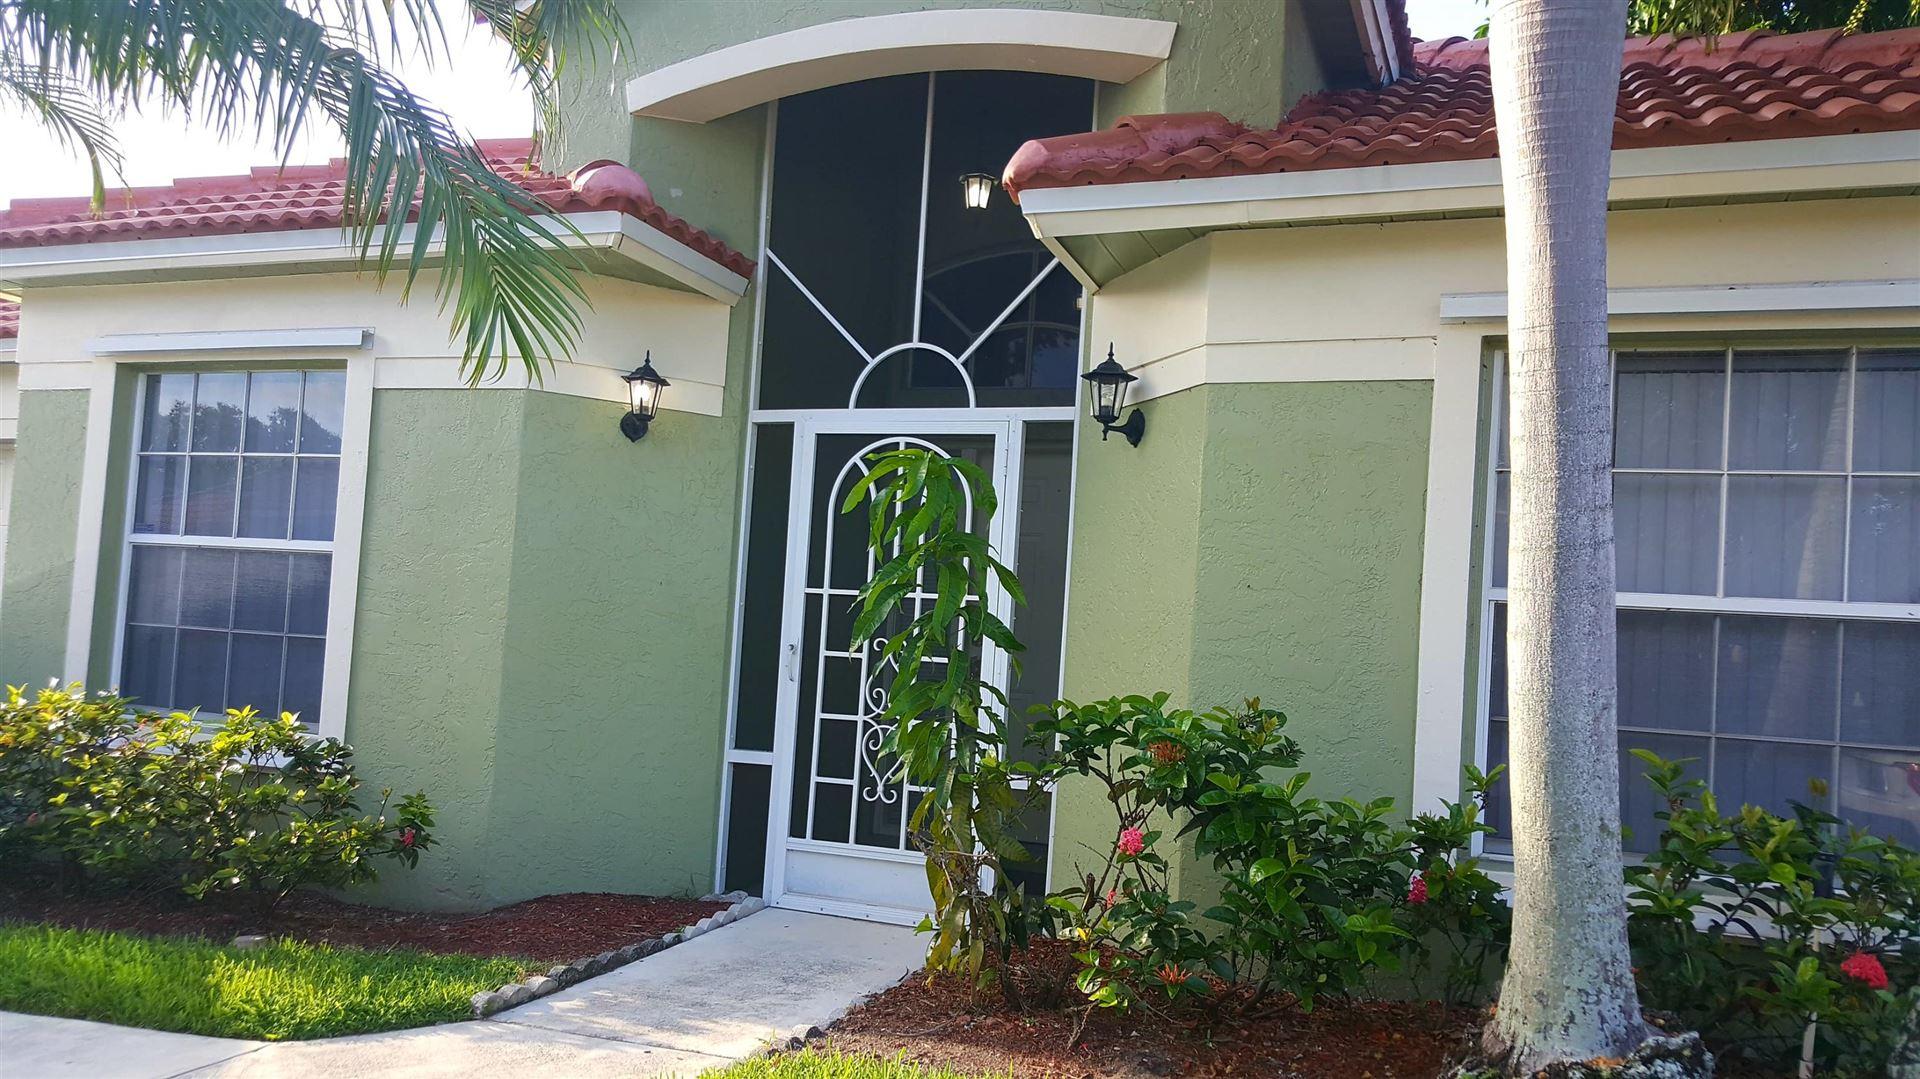 Photo of 3101 Contego Lane, Riviera Beach, FL 33418 (MLS # RX-10650901)